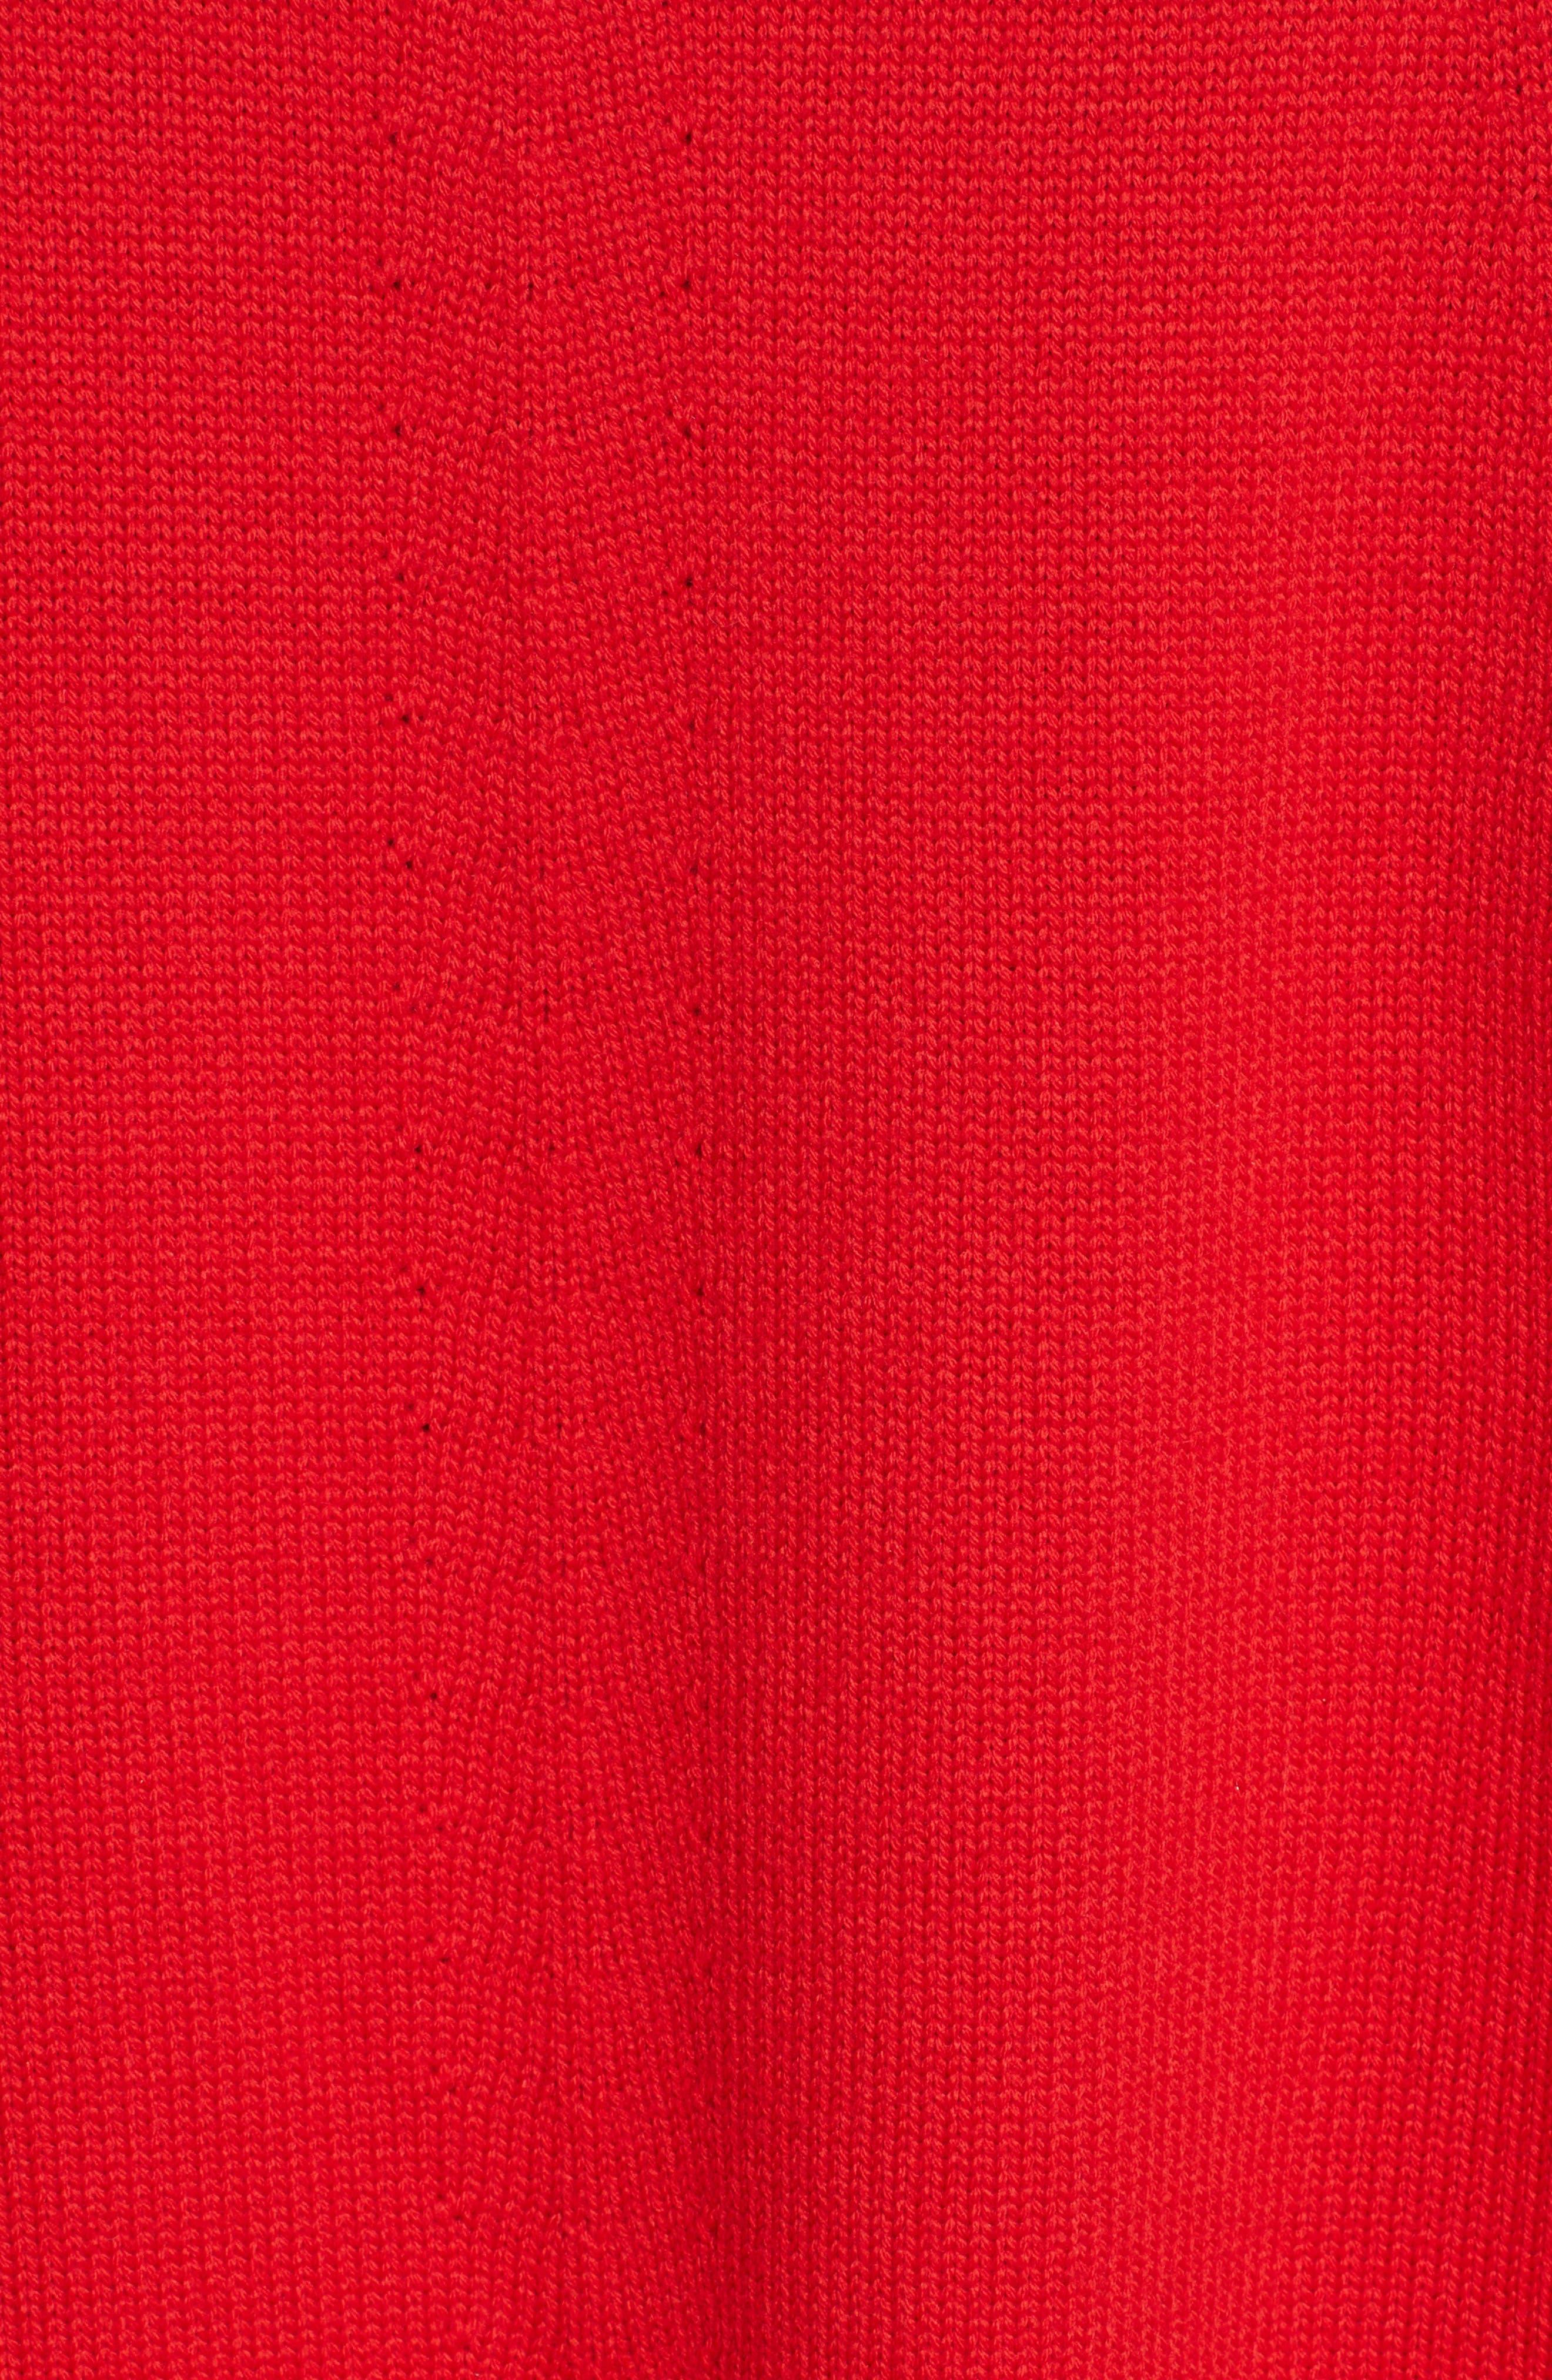 Alternate Image 3  - Oscar de la Renta Virgin Wool Turtleneck Sweater